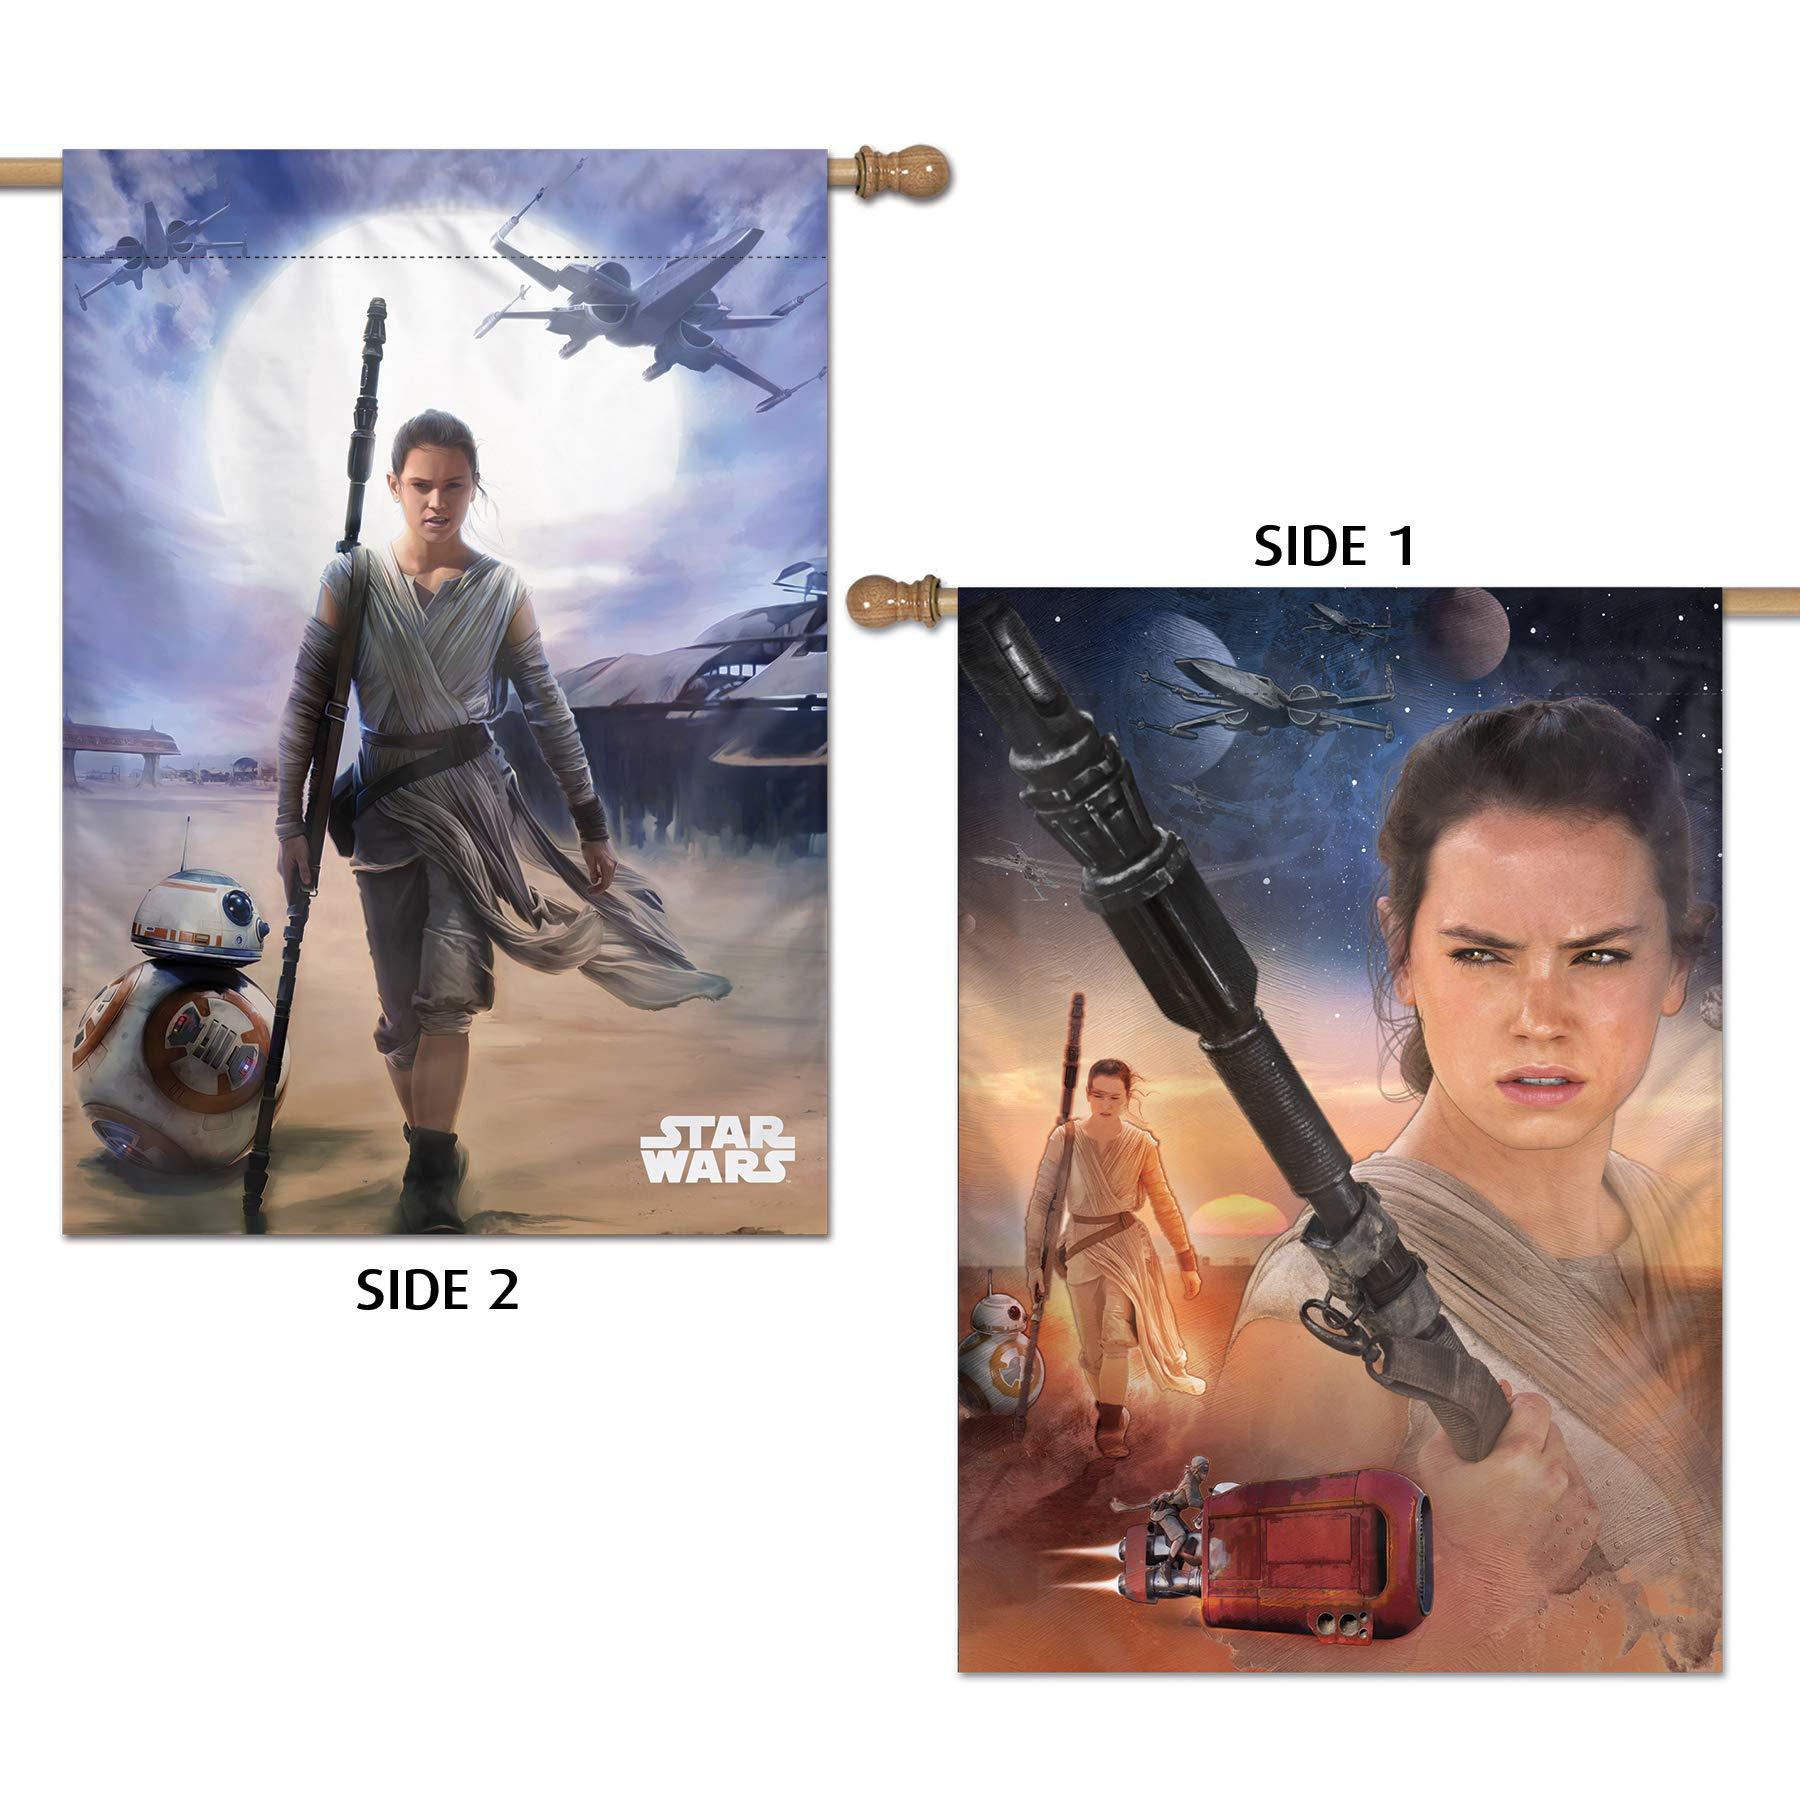 WinCraft Star Wars Star Wars Star Wars/New Trilogy 28'' x 40'' Vertical Flag 2 SidedWinCraft Star Wars/New Trilogy 28'' x 40'' Vertical Flag 2 Sided, Multicolor, NA by WinCraft